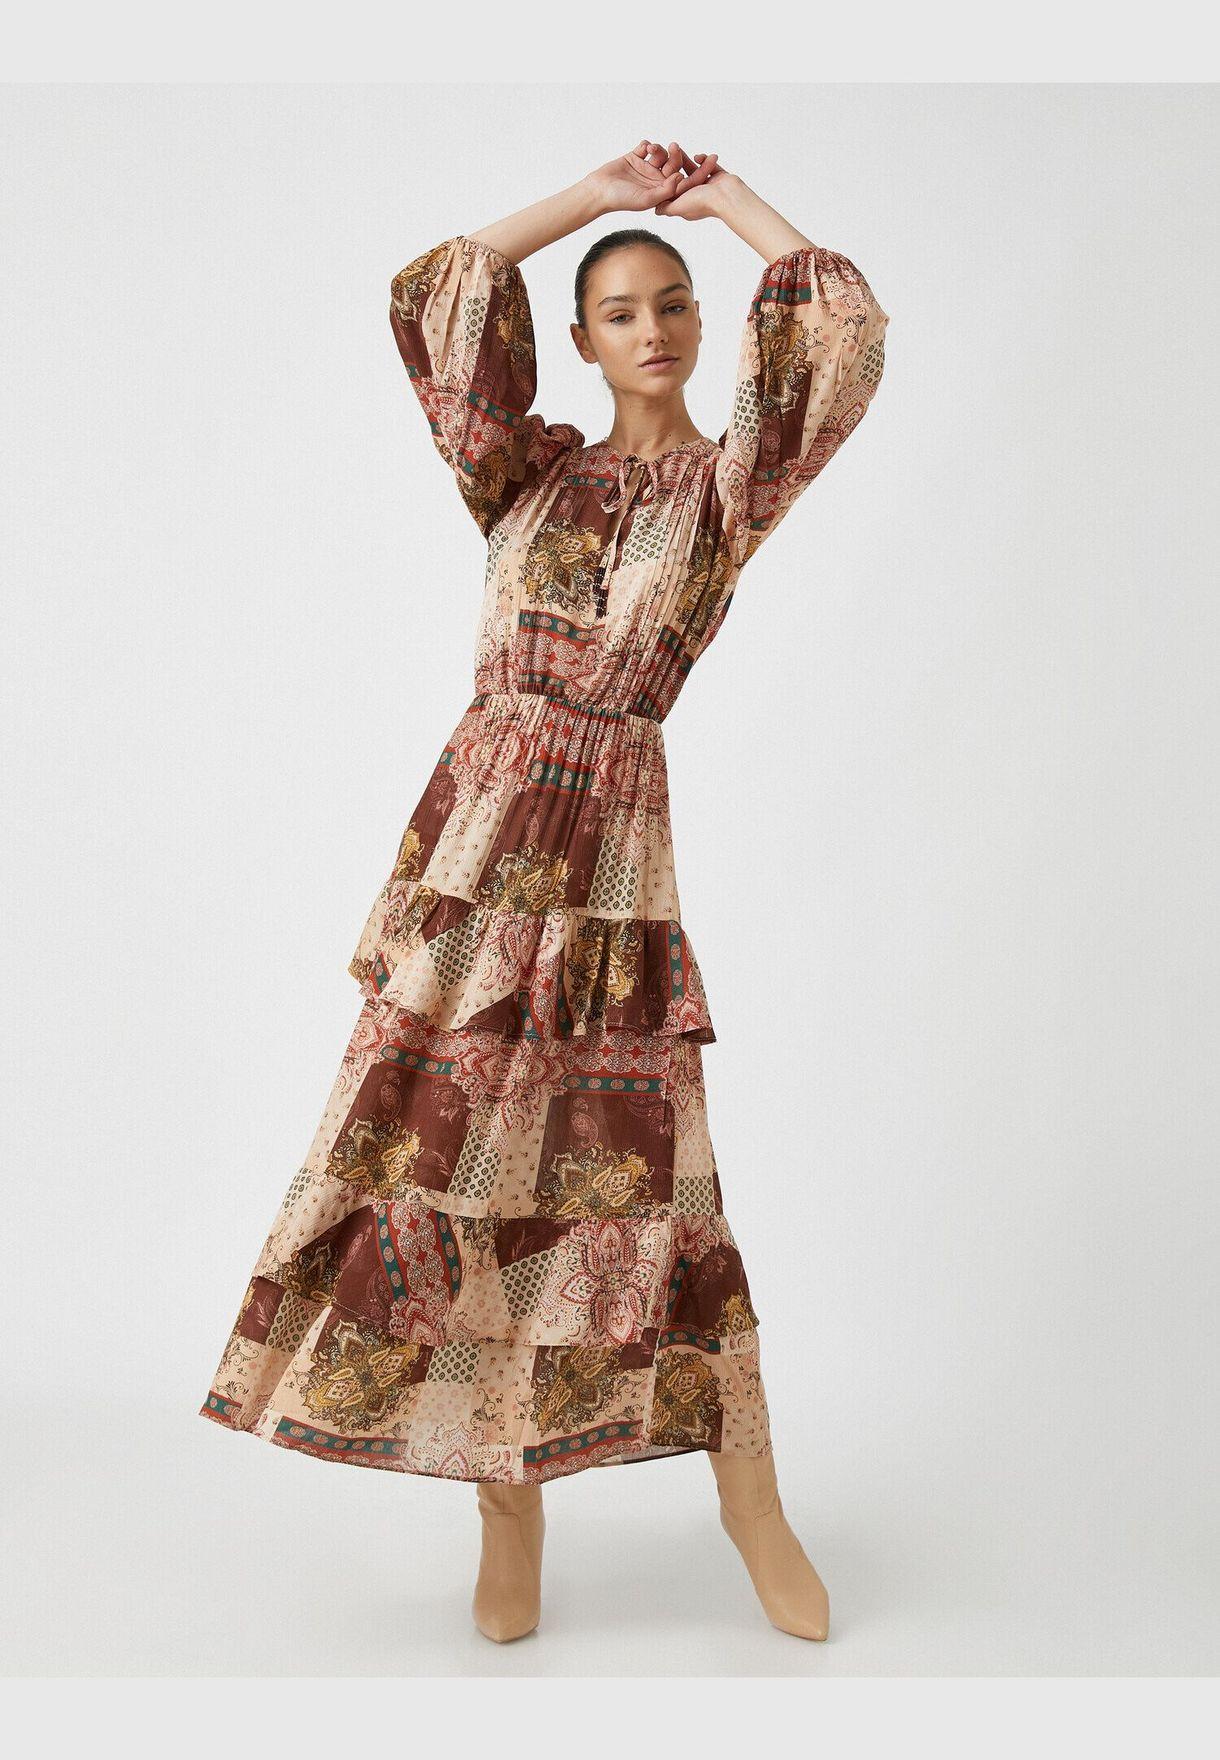 Respect Life | Yaşama Saygı - Arzu Sabancı for Koton 100% Viscose  Ethnic Printed Long Sleeve Dress